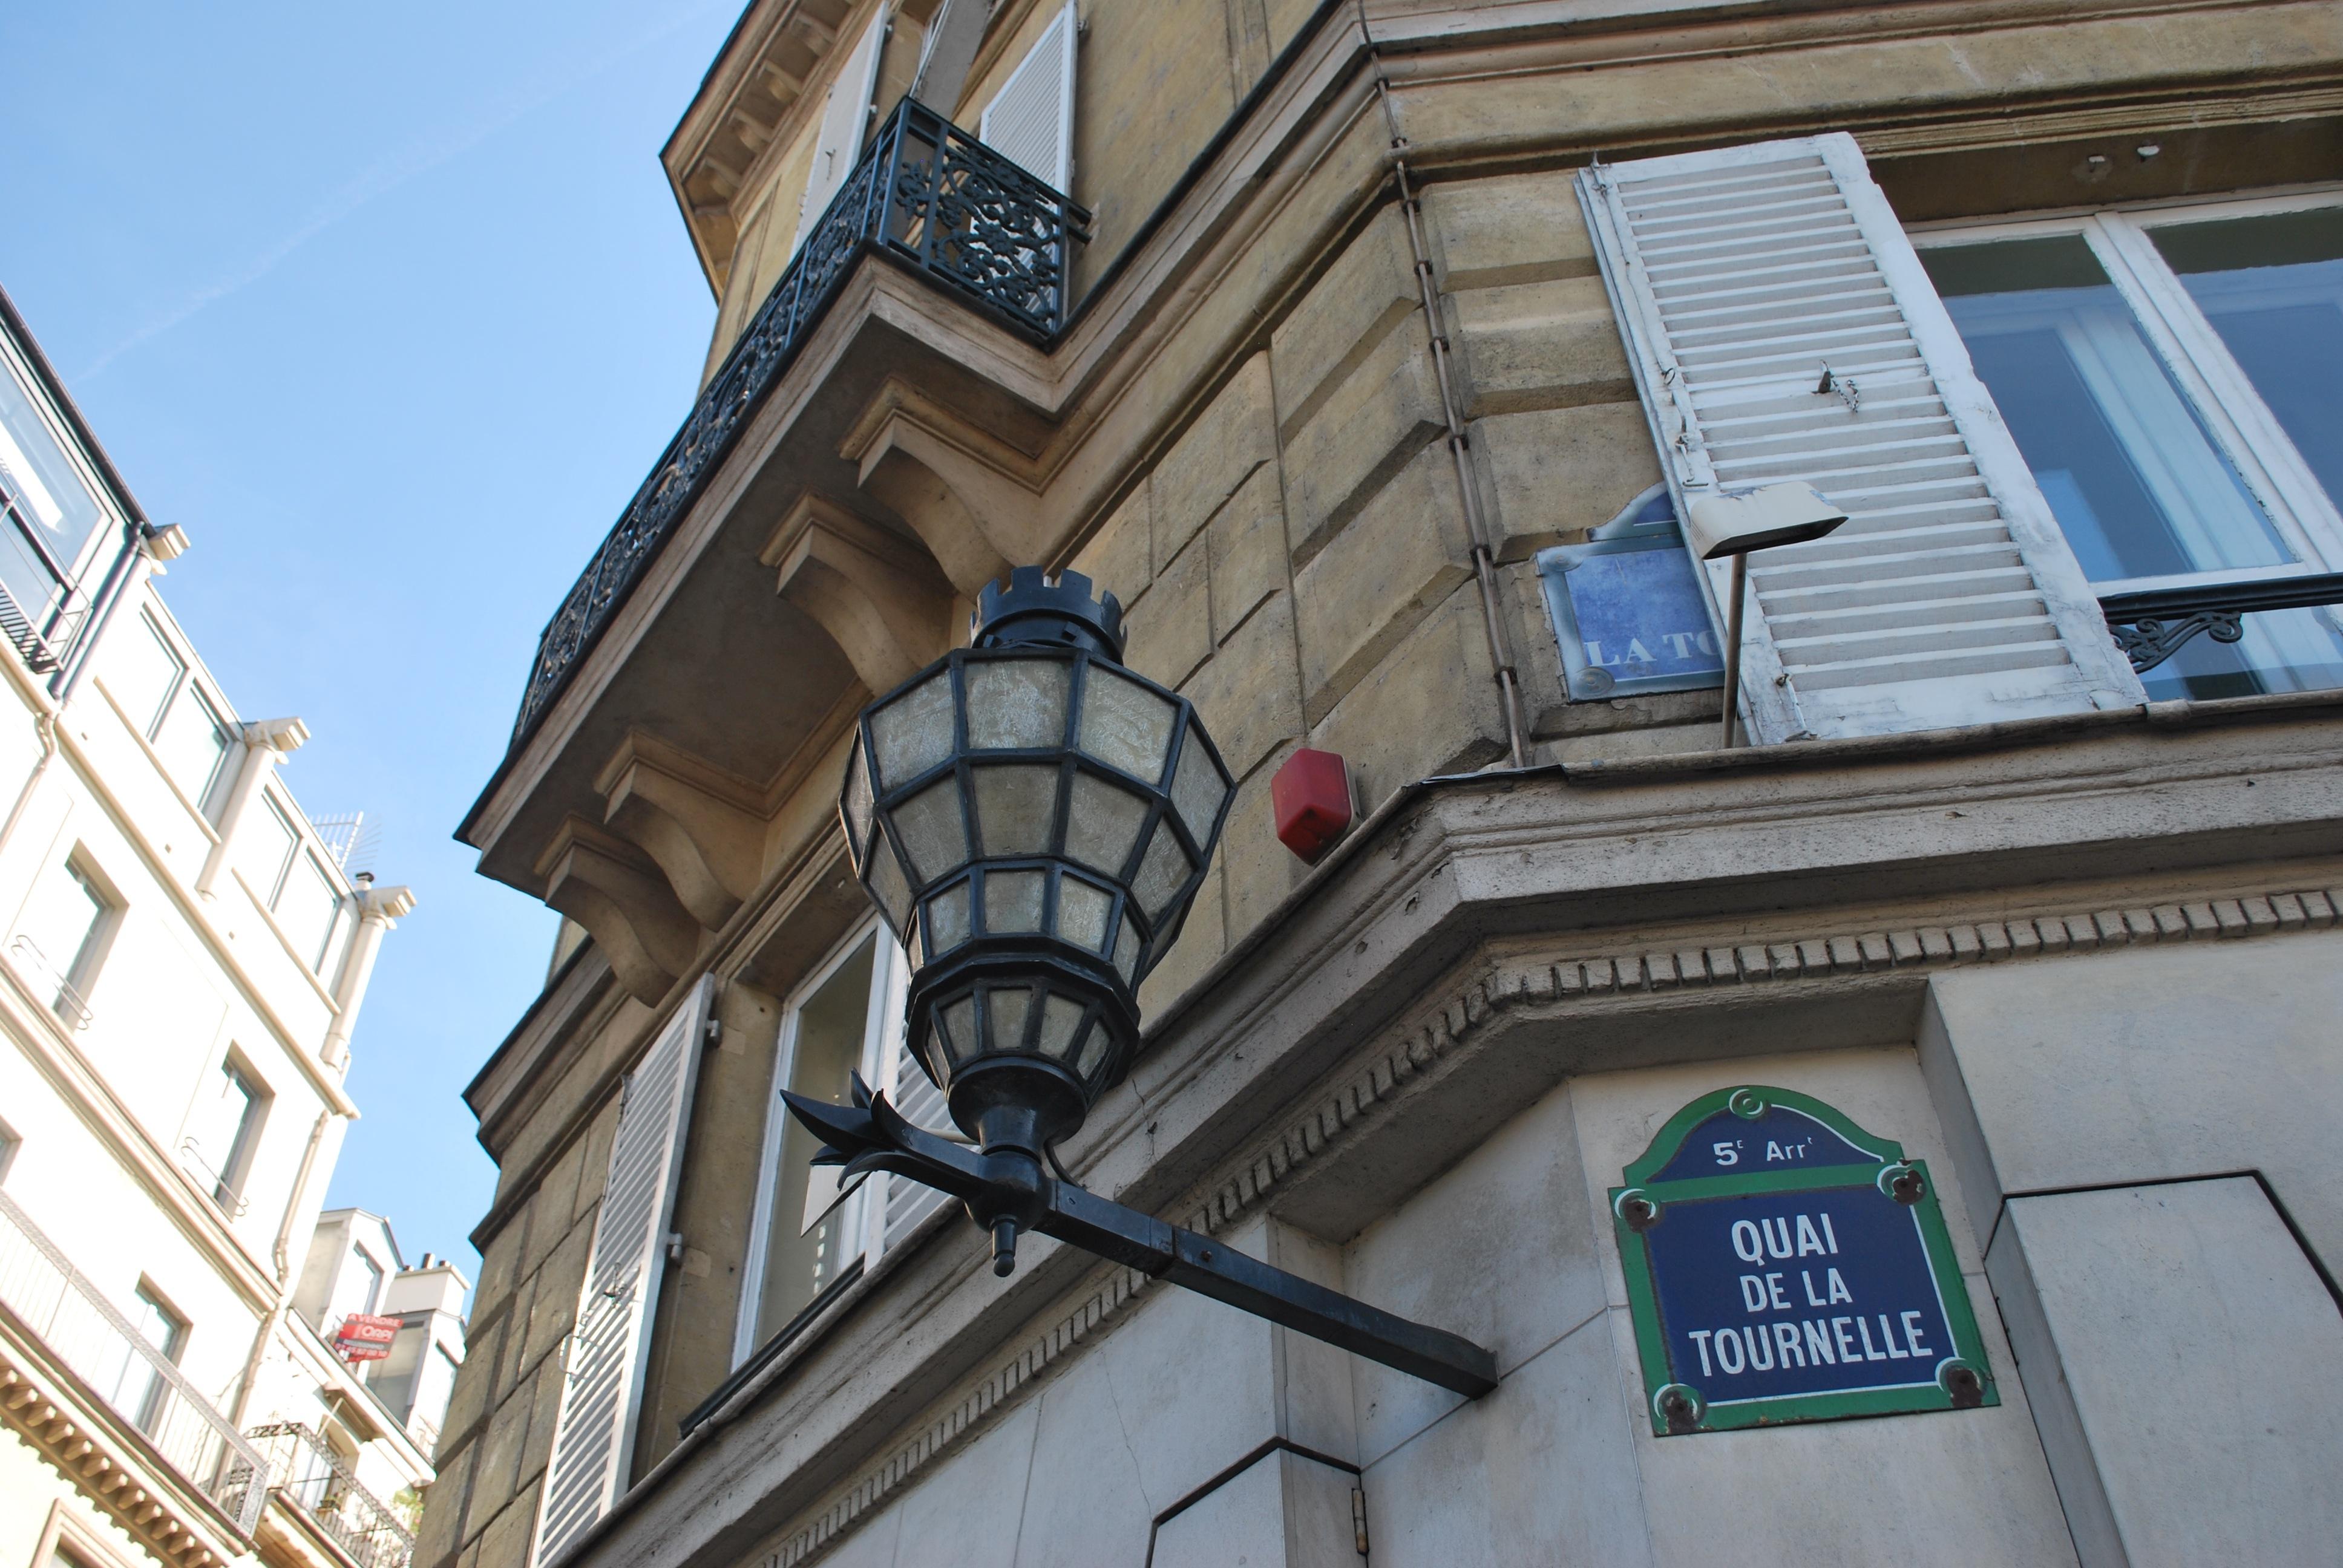 quai-de-la-tournelle-street-scene-paris